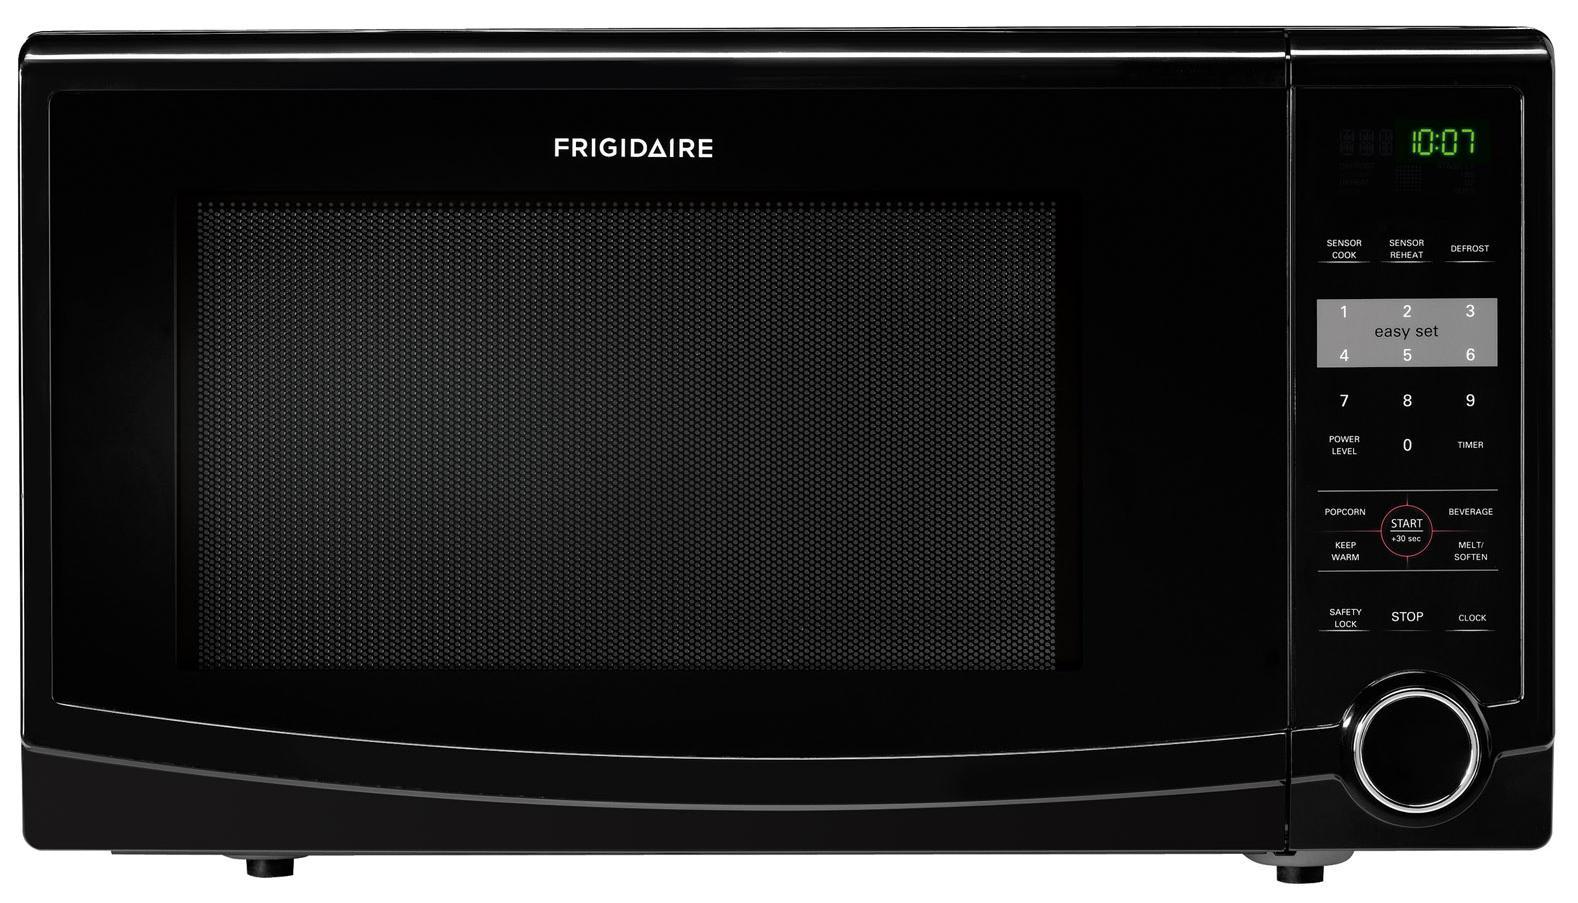 Ffcm1134lb Frigidaire Ffcm1134lb Countertop Microwaves